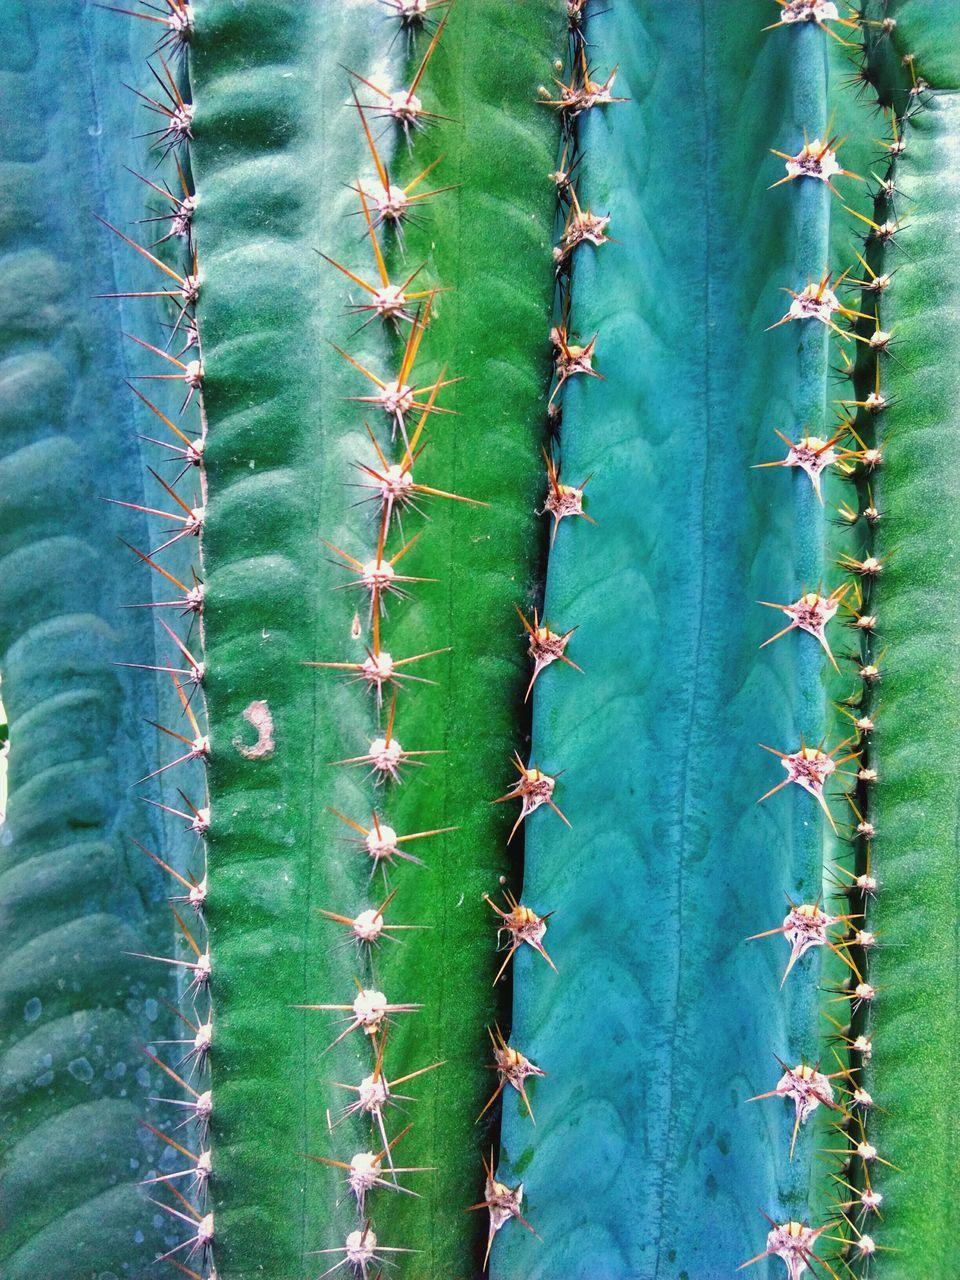 Detail Shot Of Cactus Plant